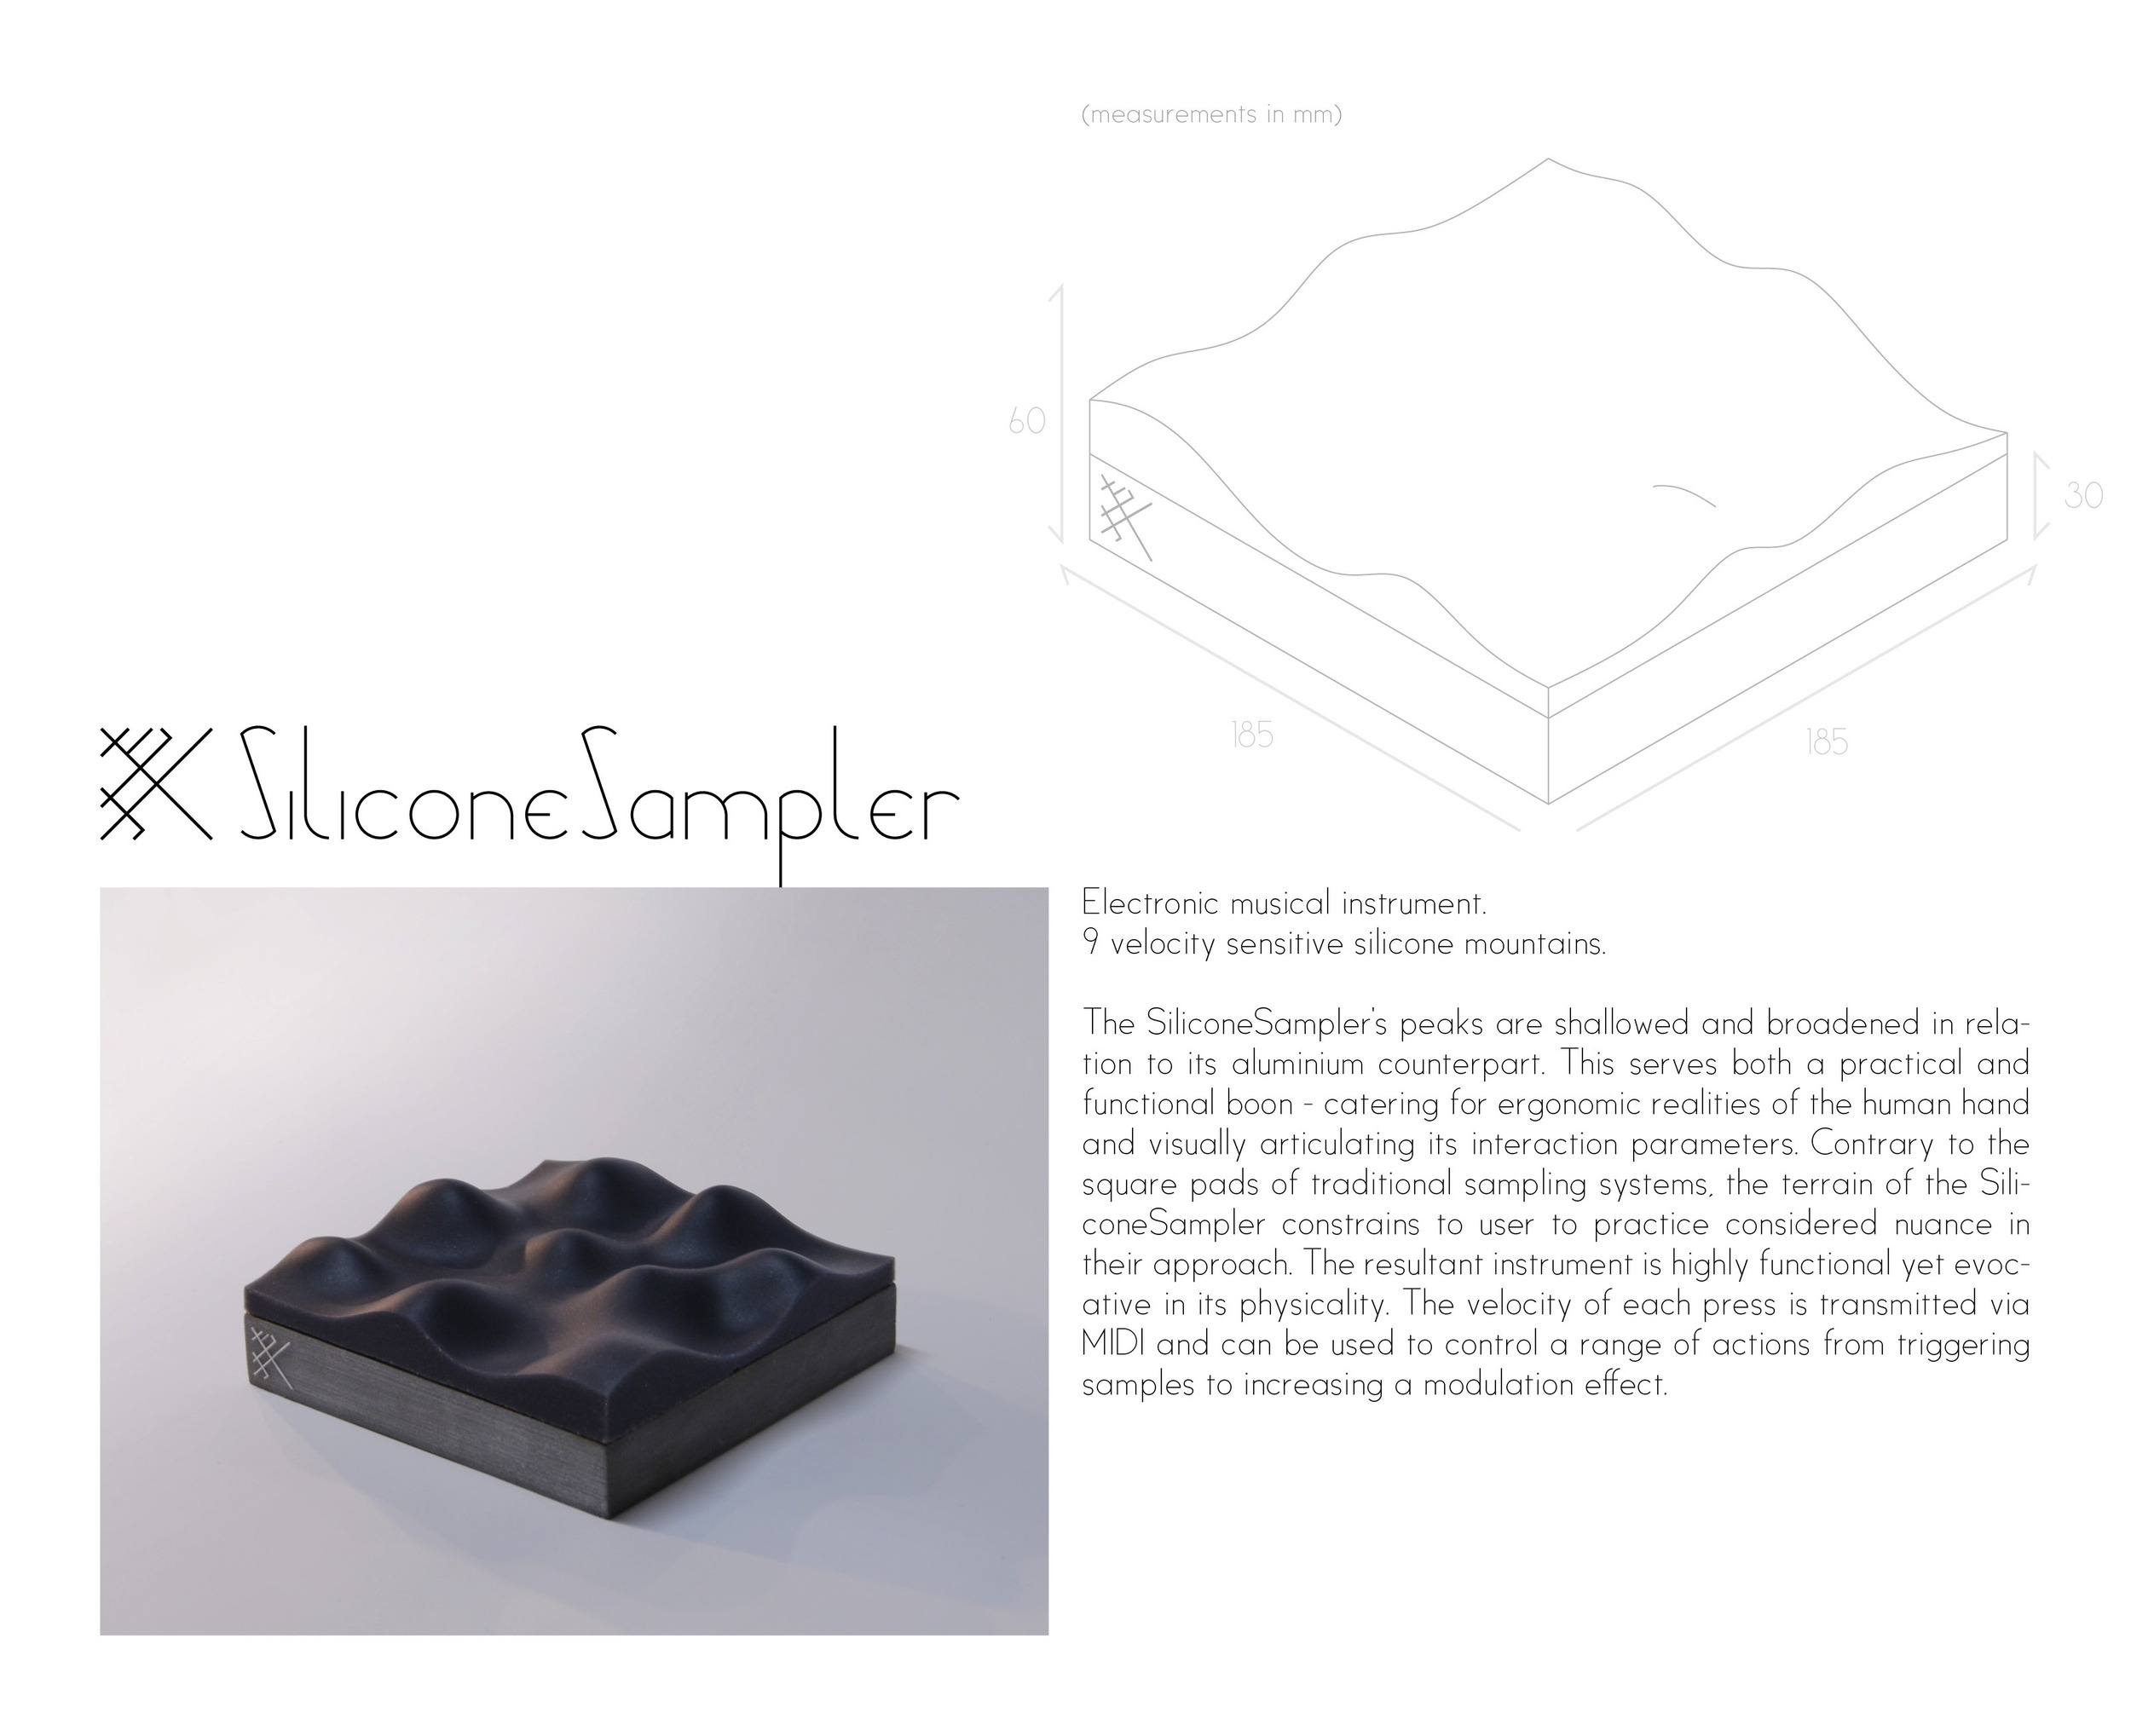 SiliconeSampler.jpg